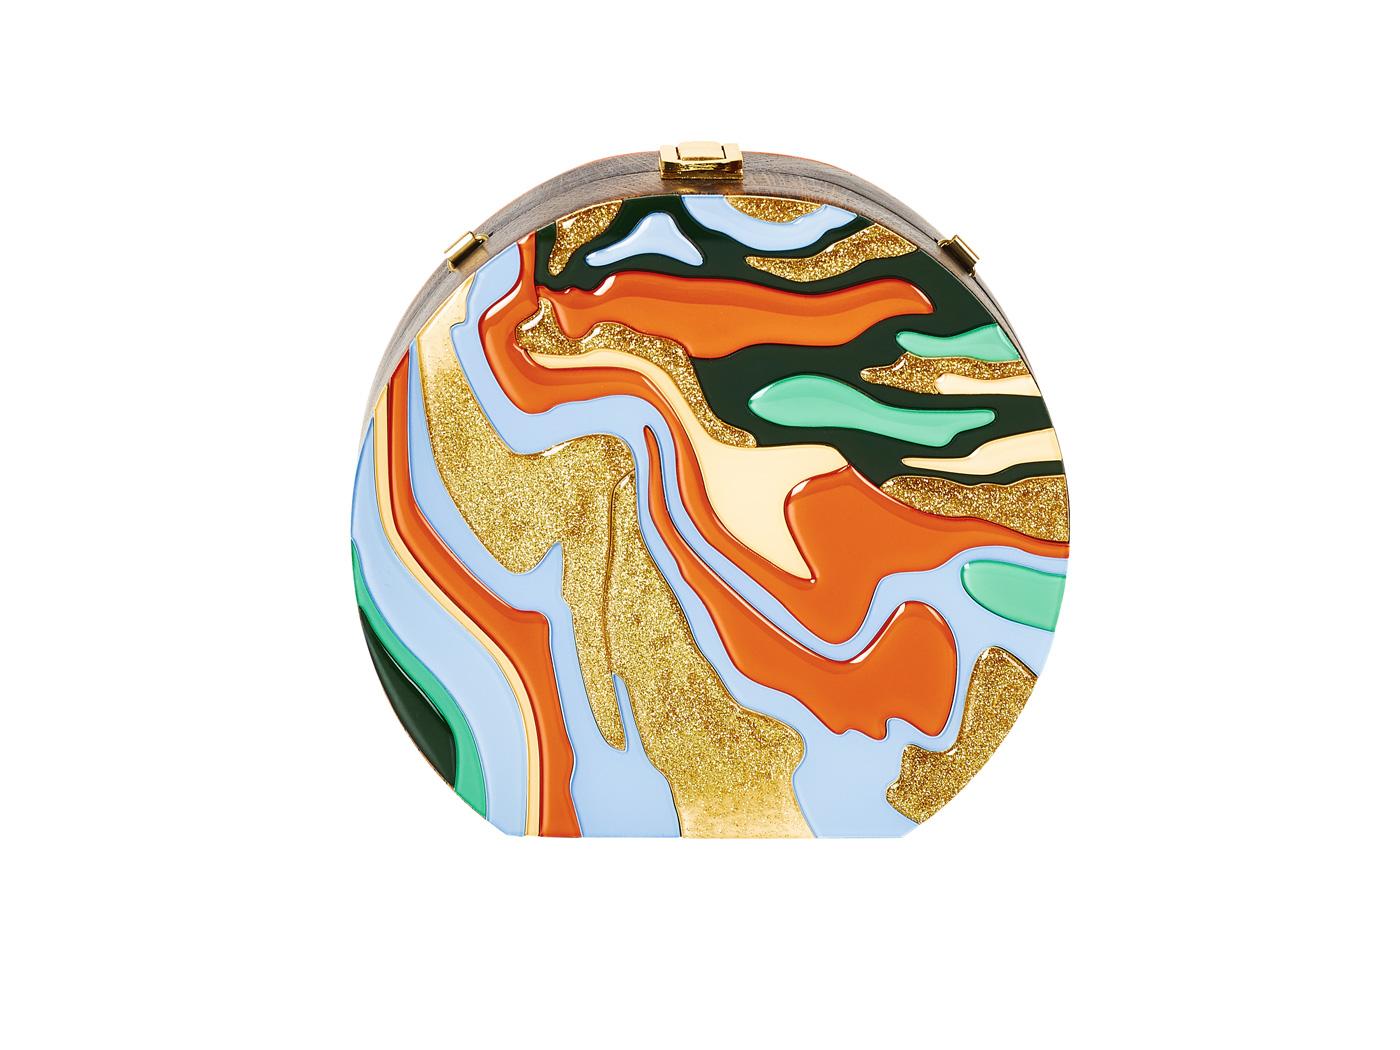 Golovina-marble-clutch-bag-orange-and-blue-1